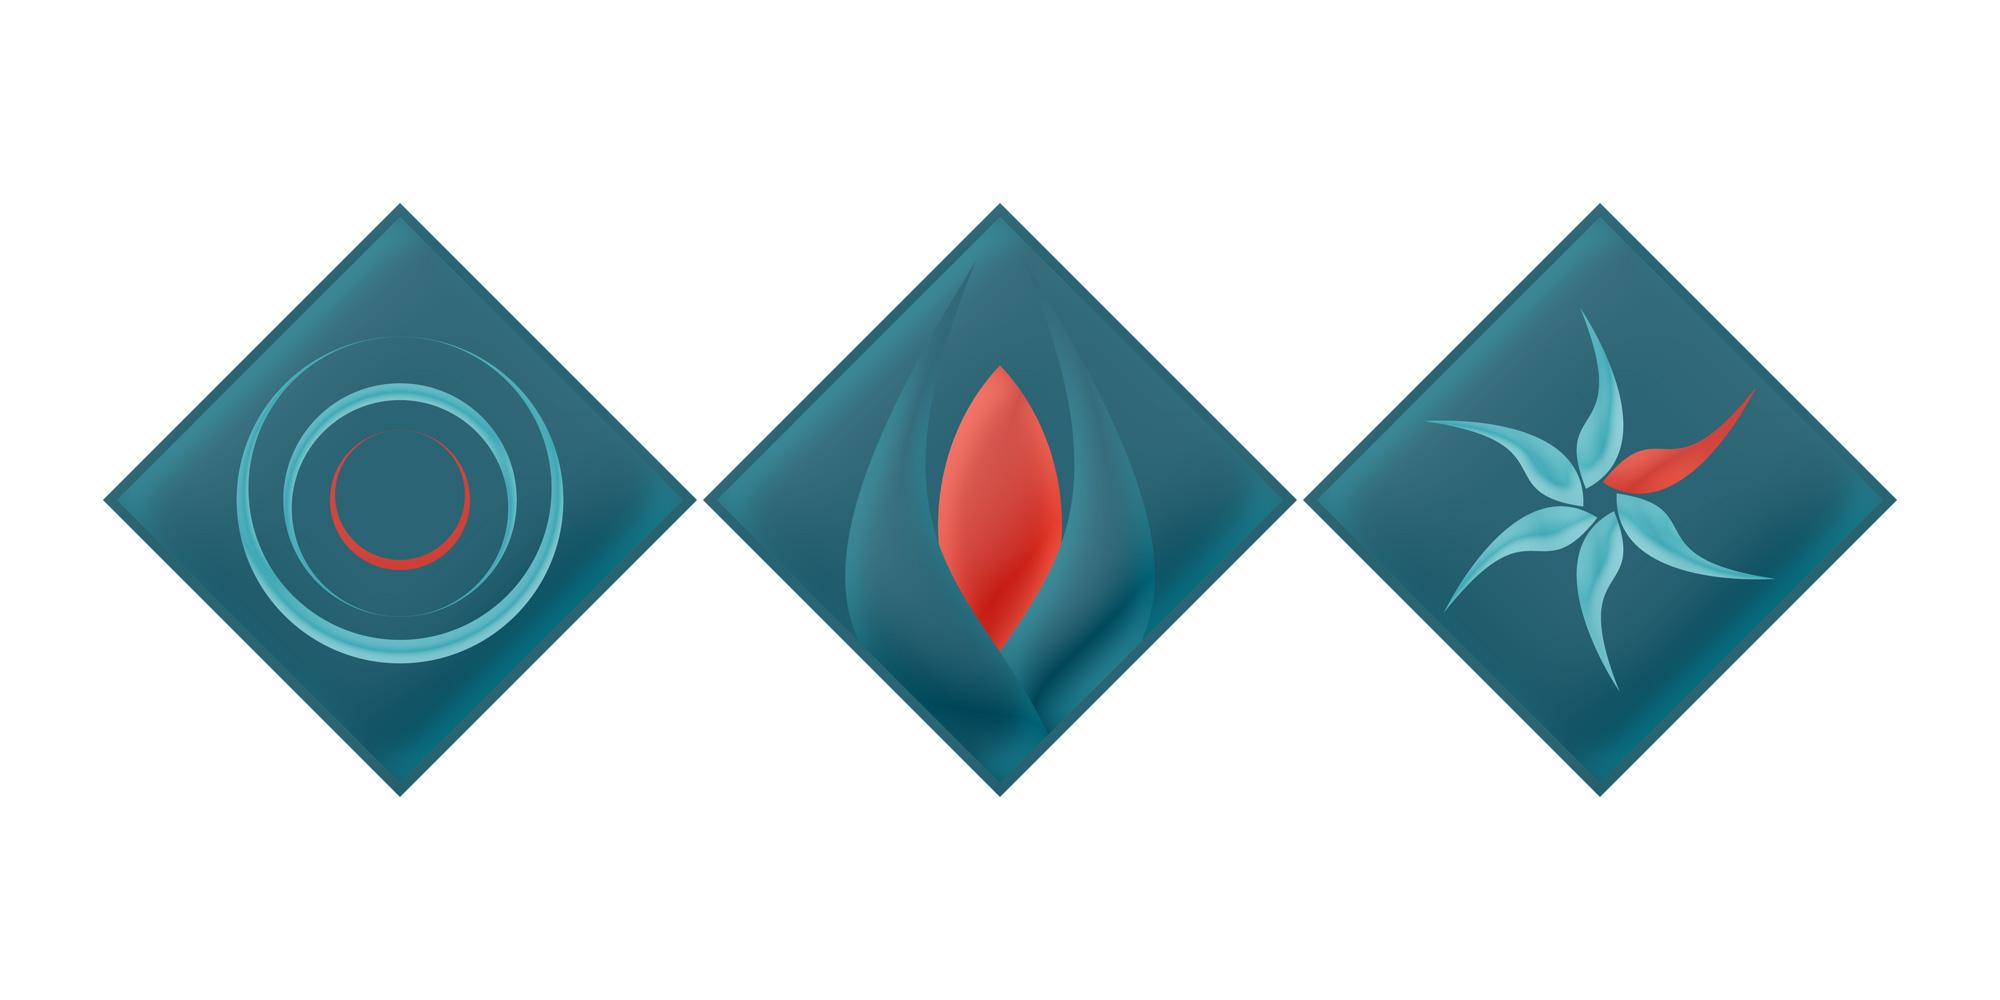 KRA-logo-icons-3.jpg